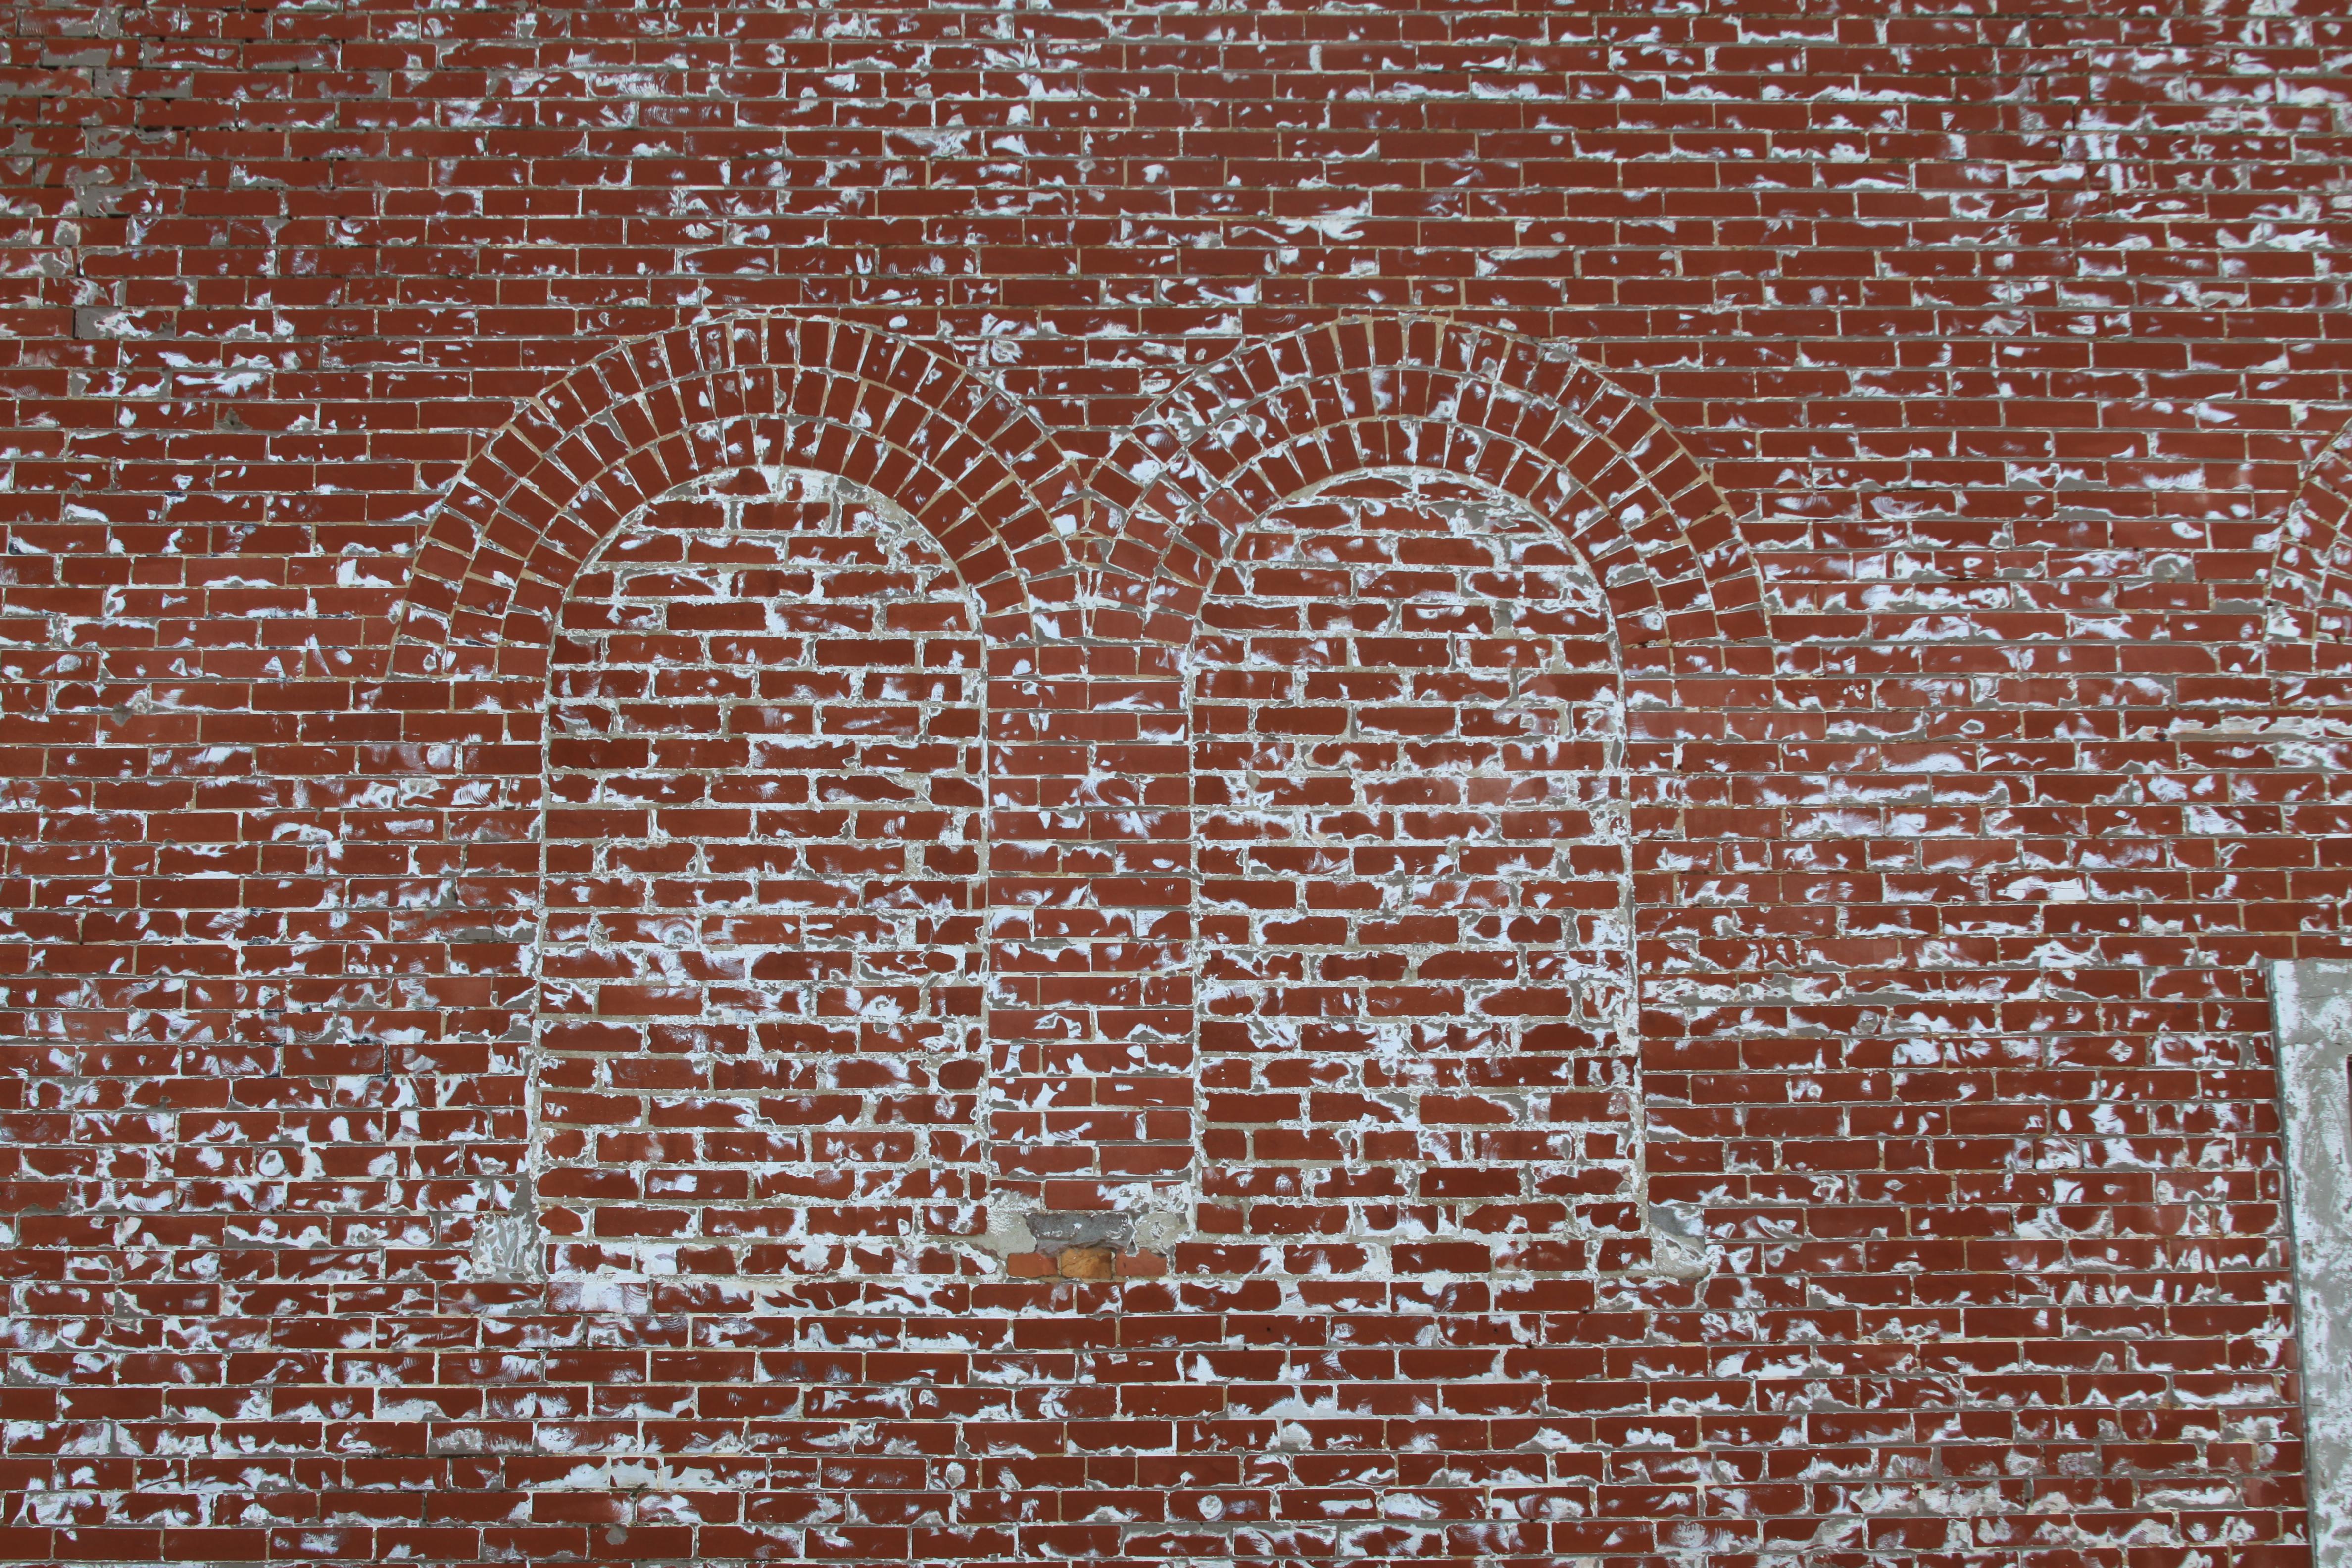 Original church windows, north side of building